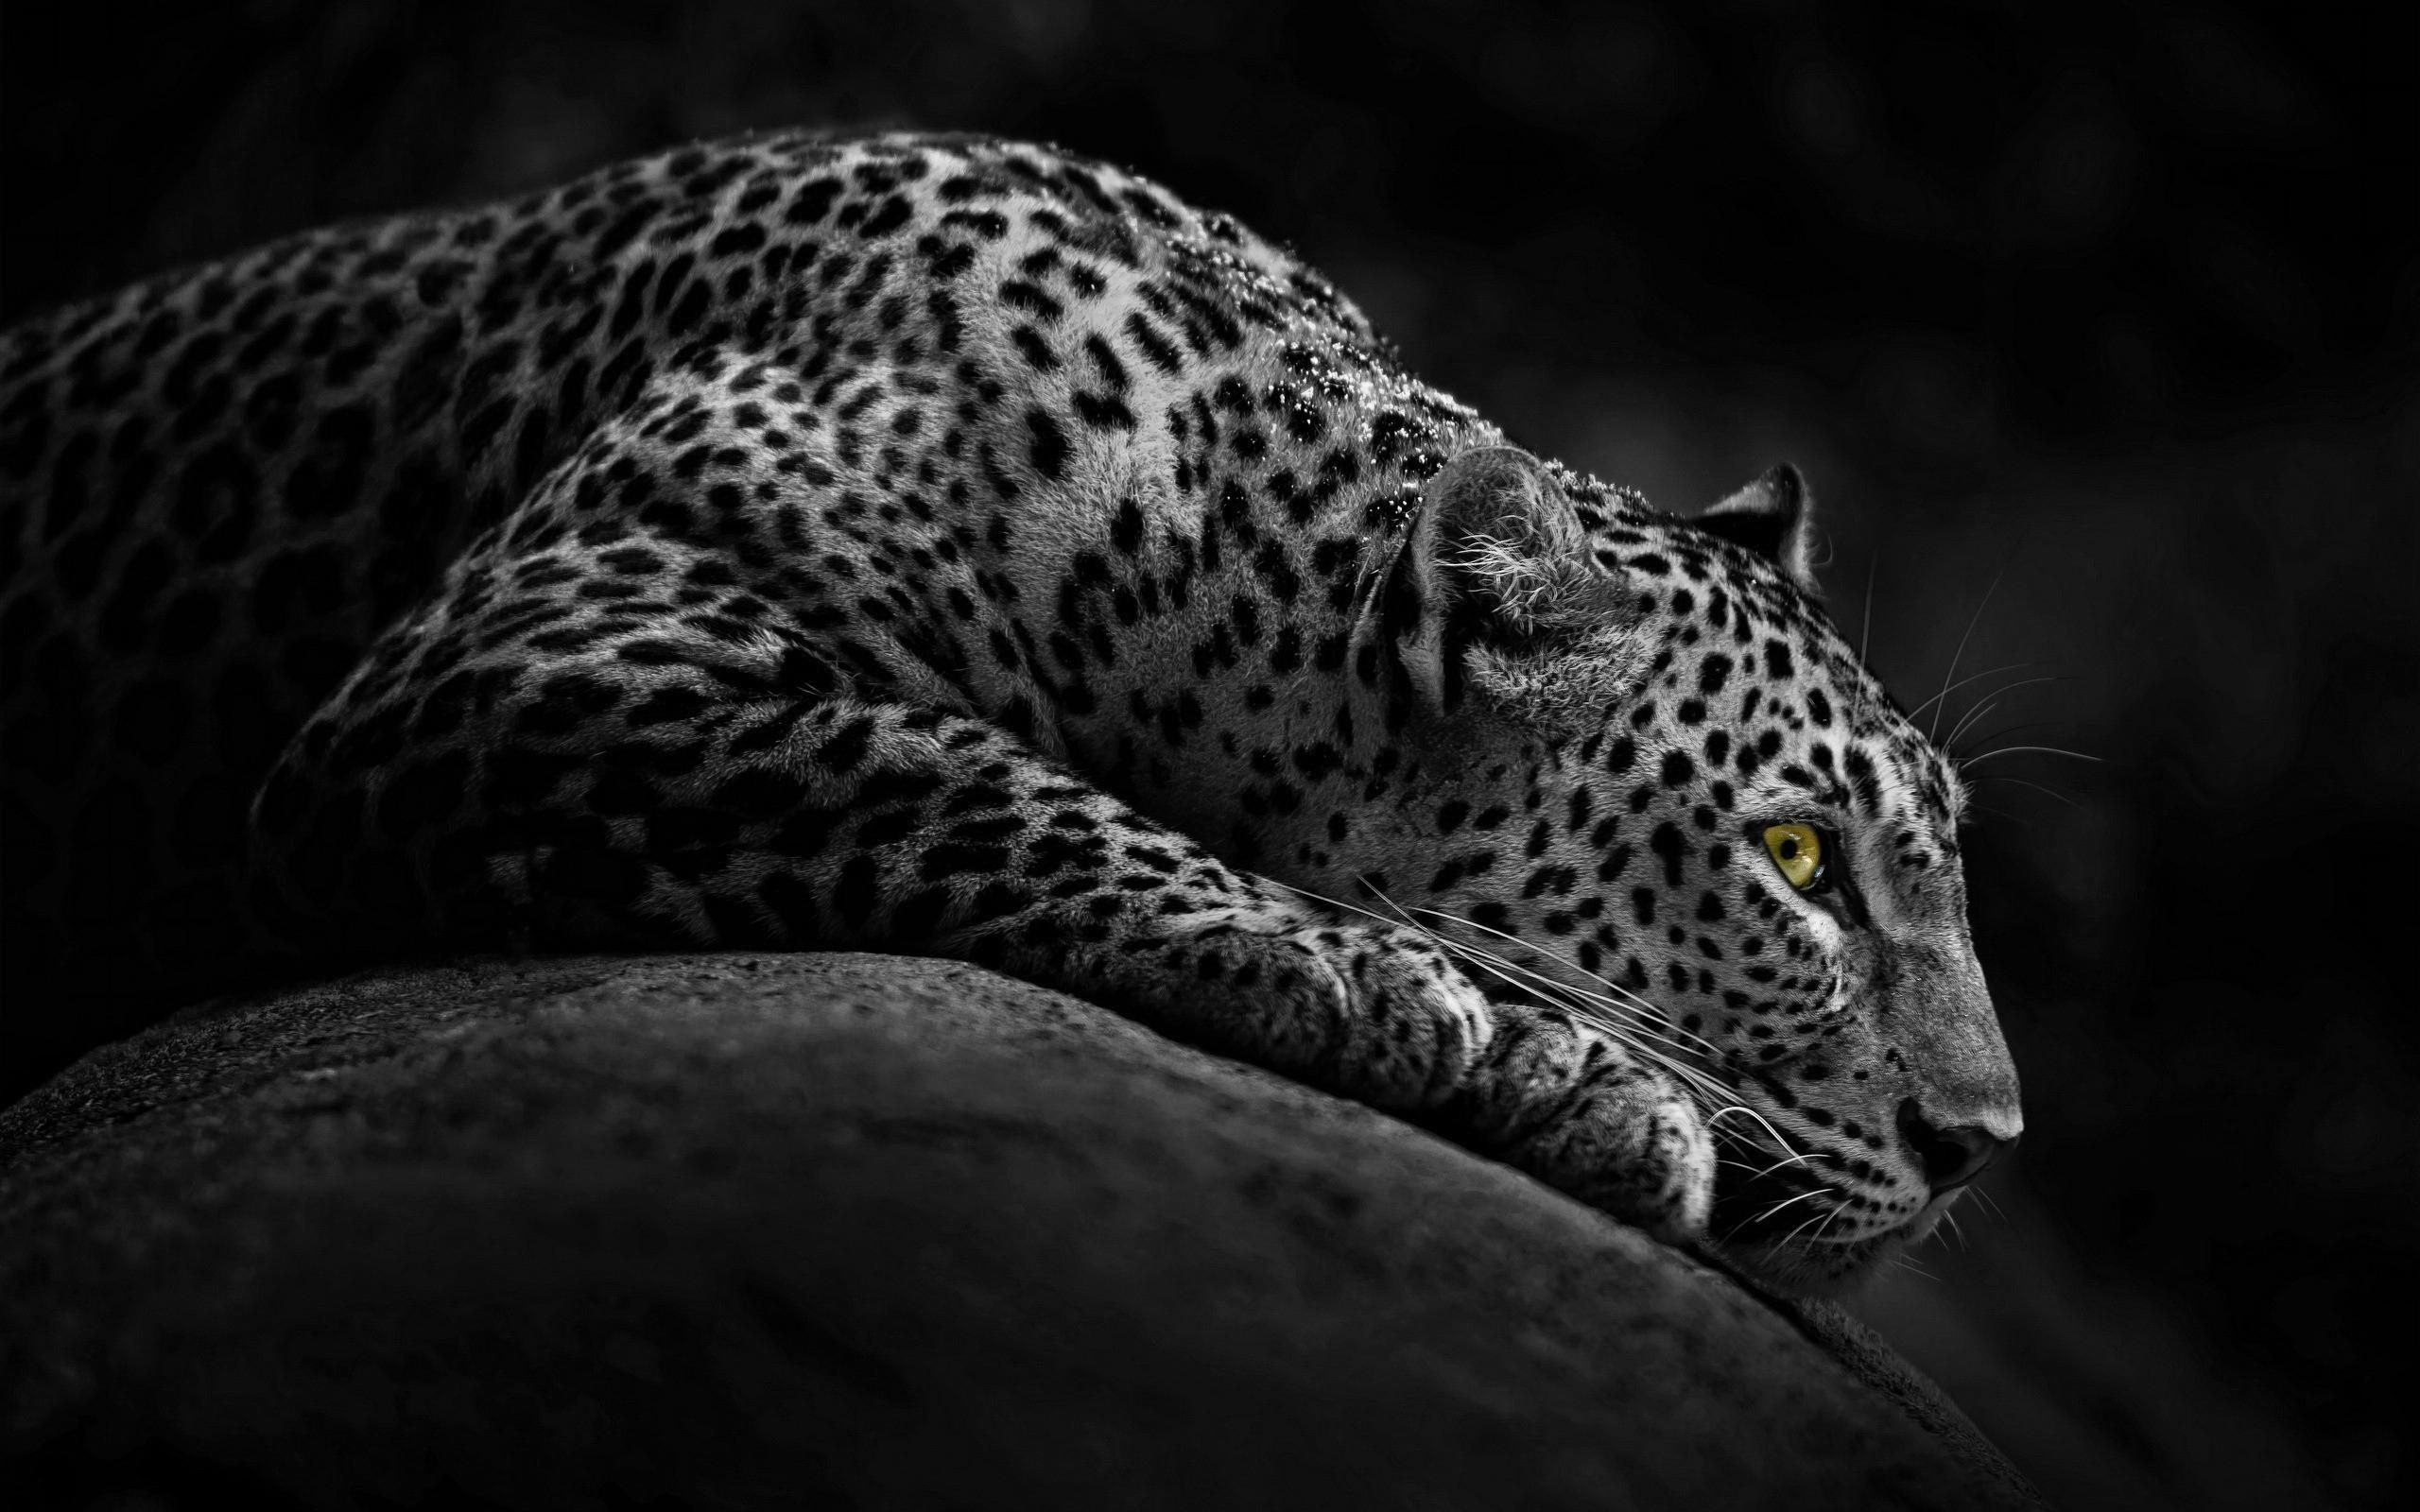 Jaguar's Eye by MeGustaDeviantart on DeviantArt